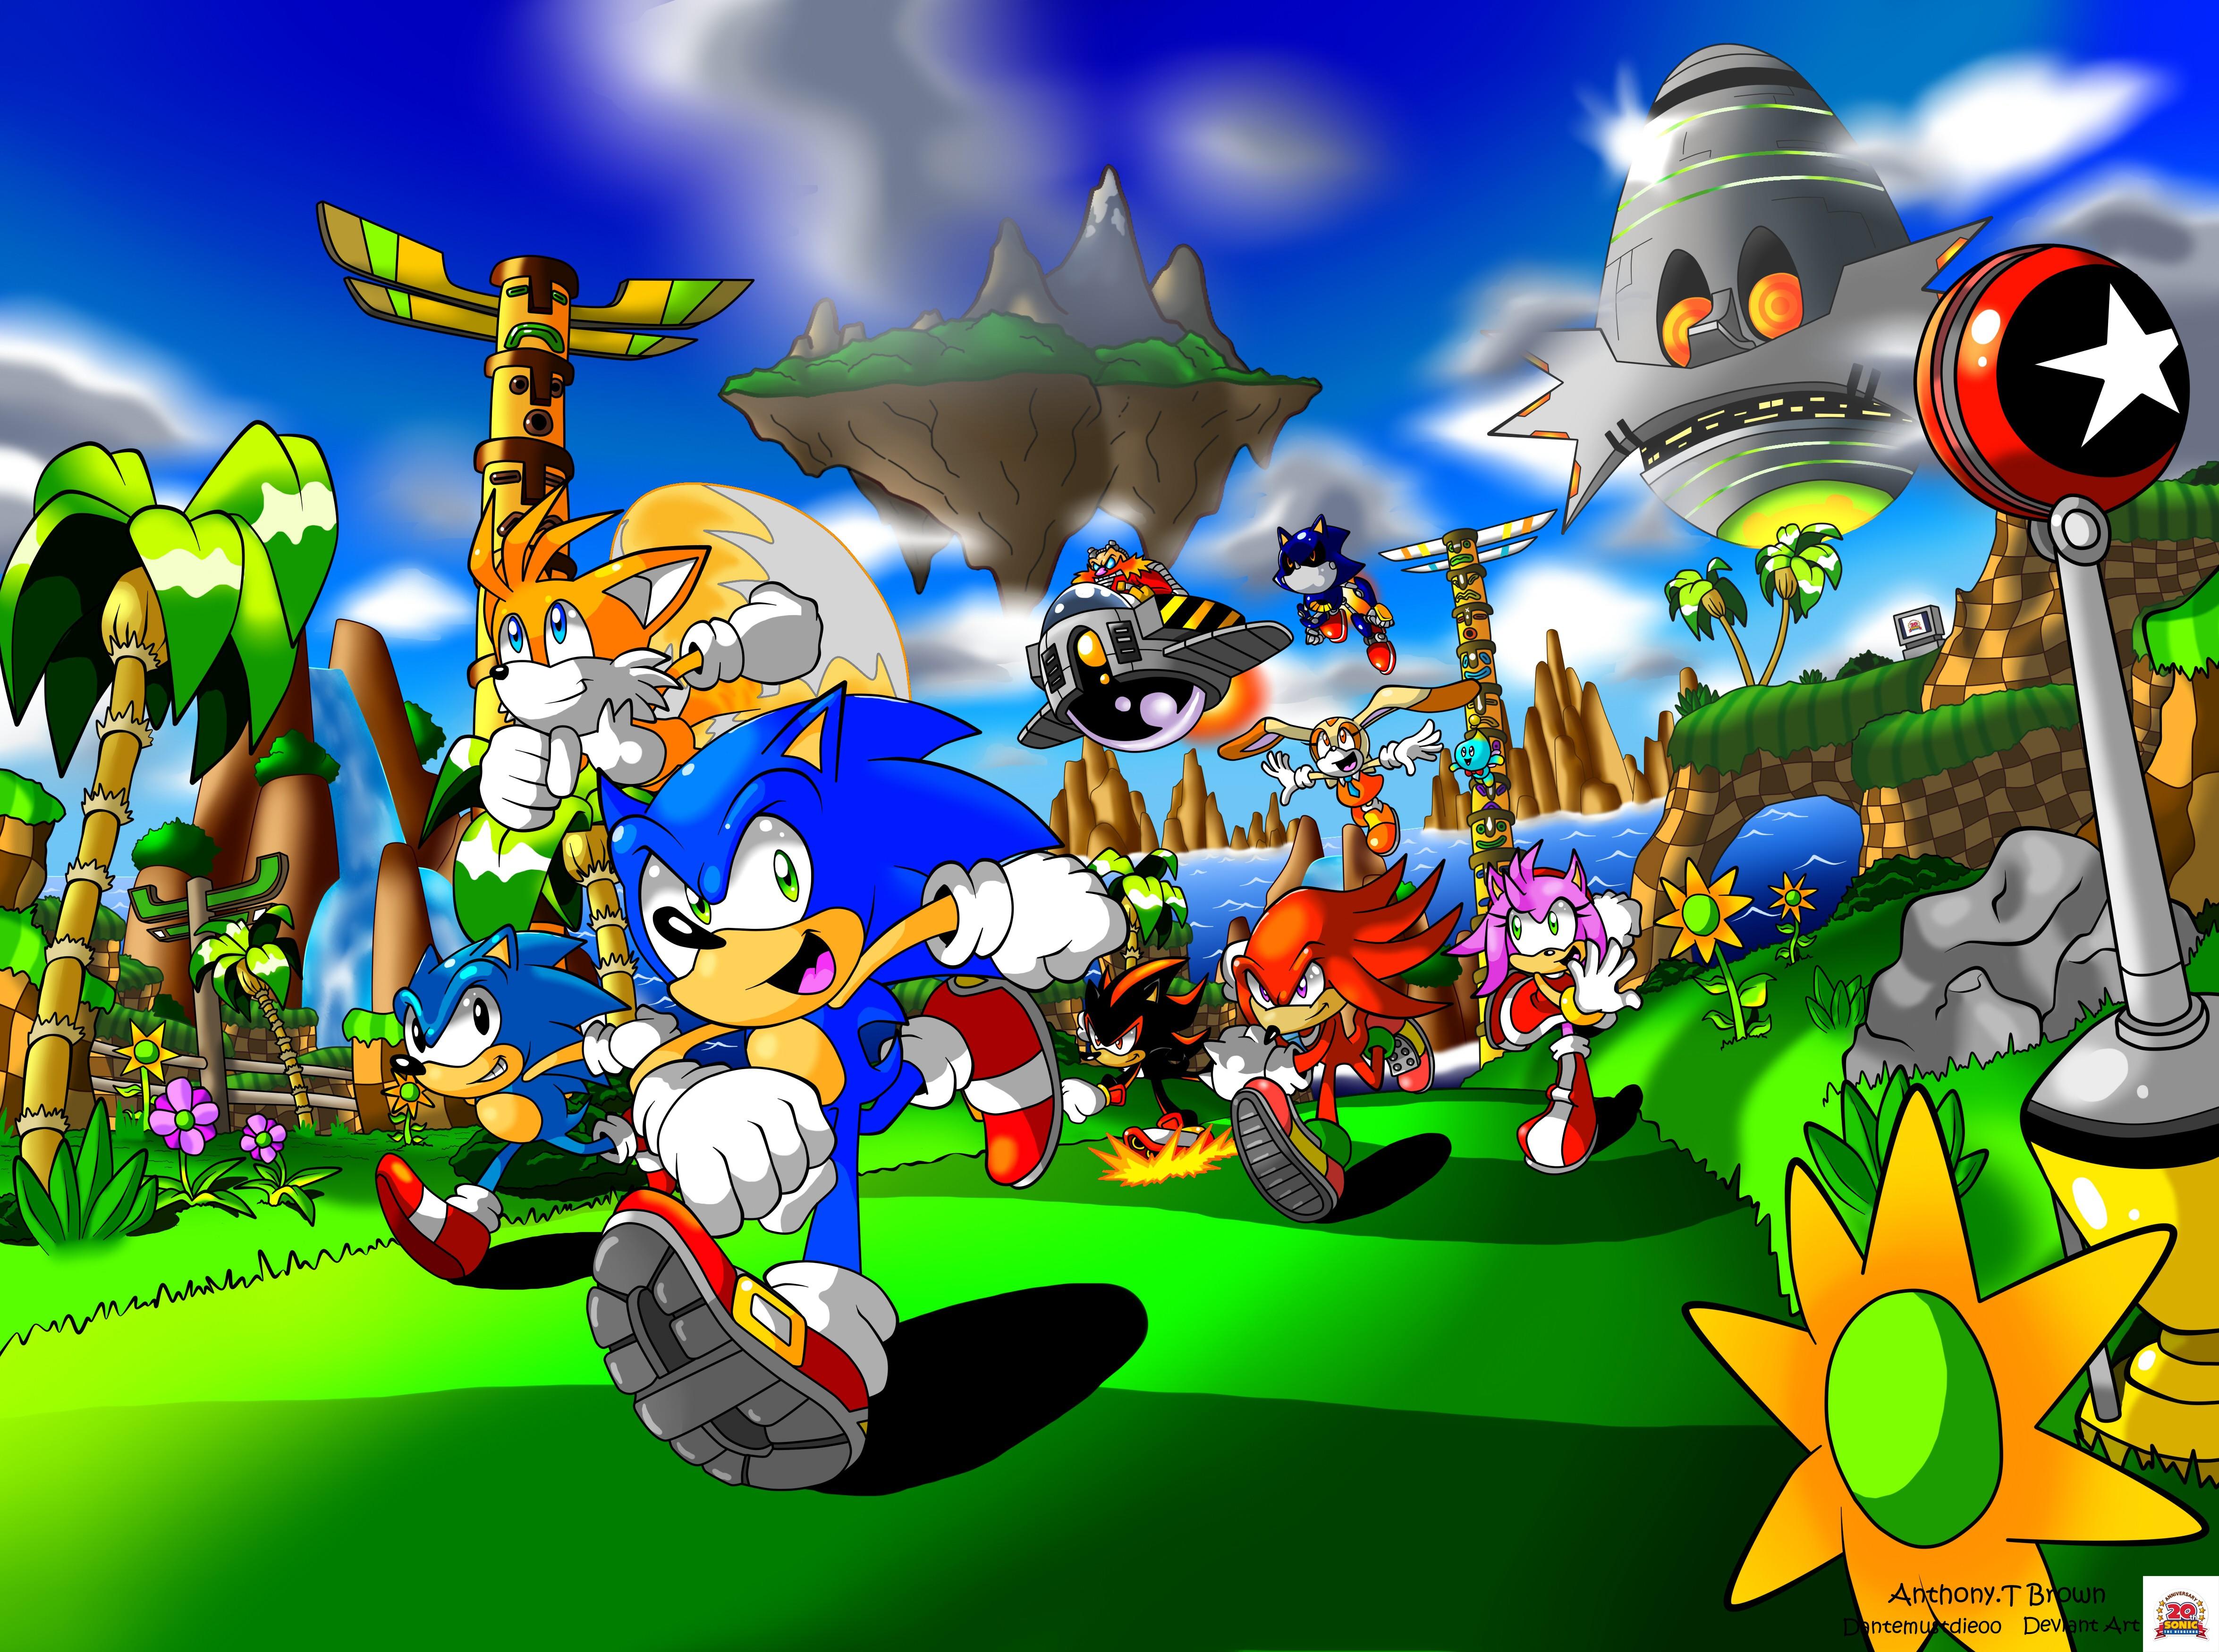 Wallpaper Illustration Cartoon Sonic The Hedgehog Jungle